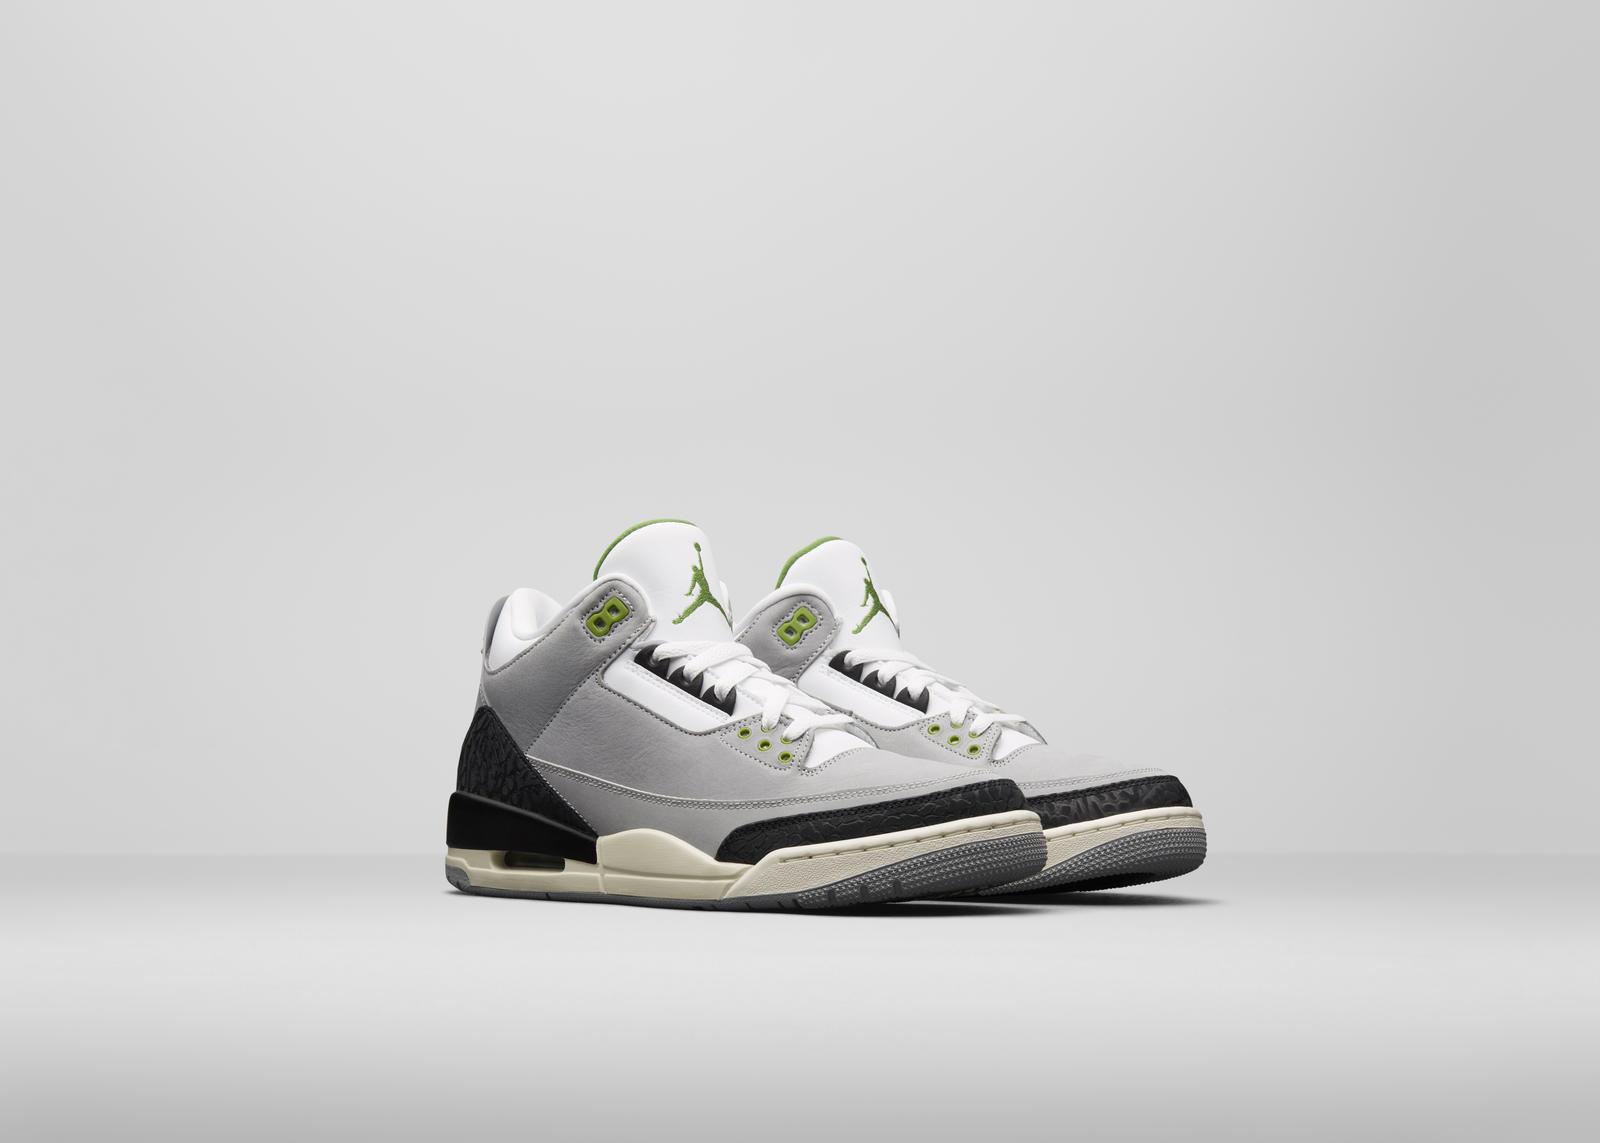 Jordan Brand 2018 Holiday Releases - Nike News